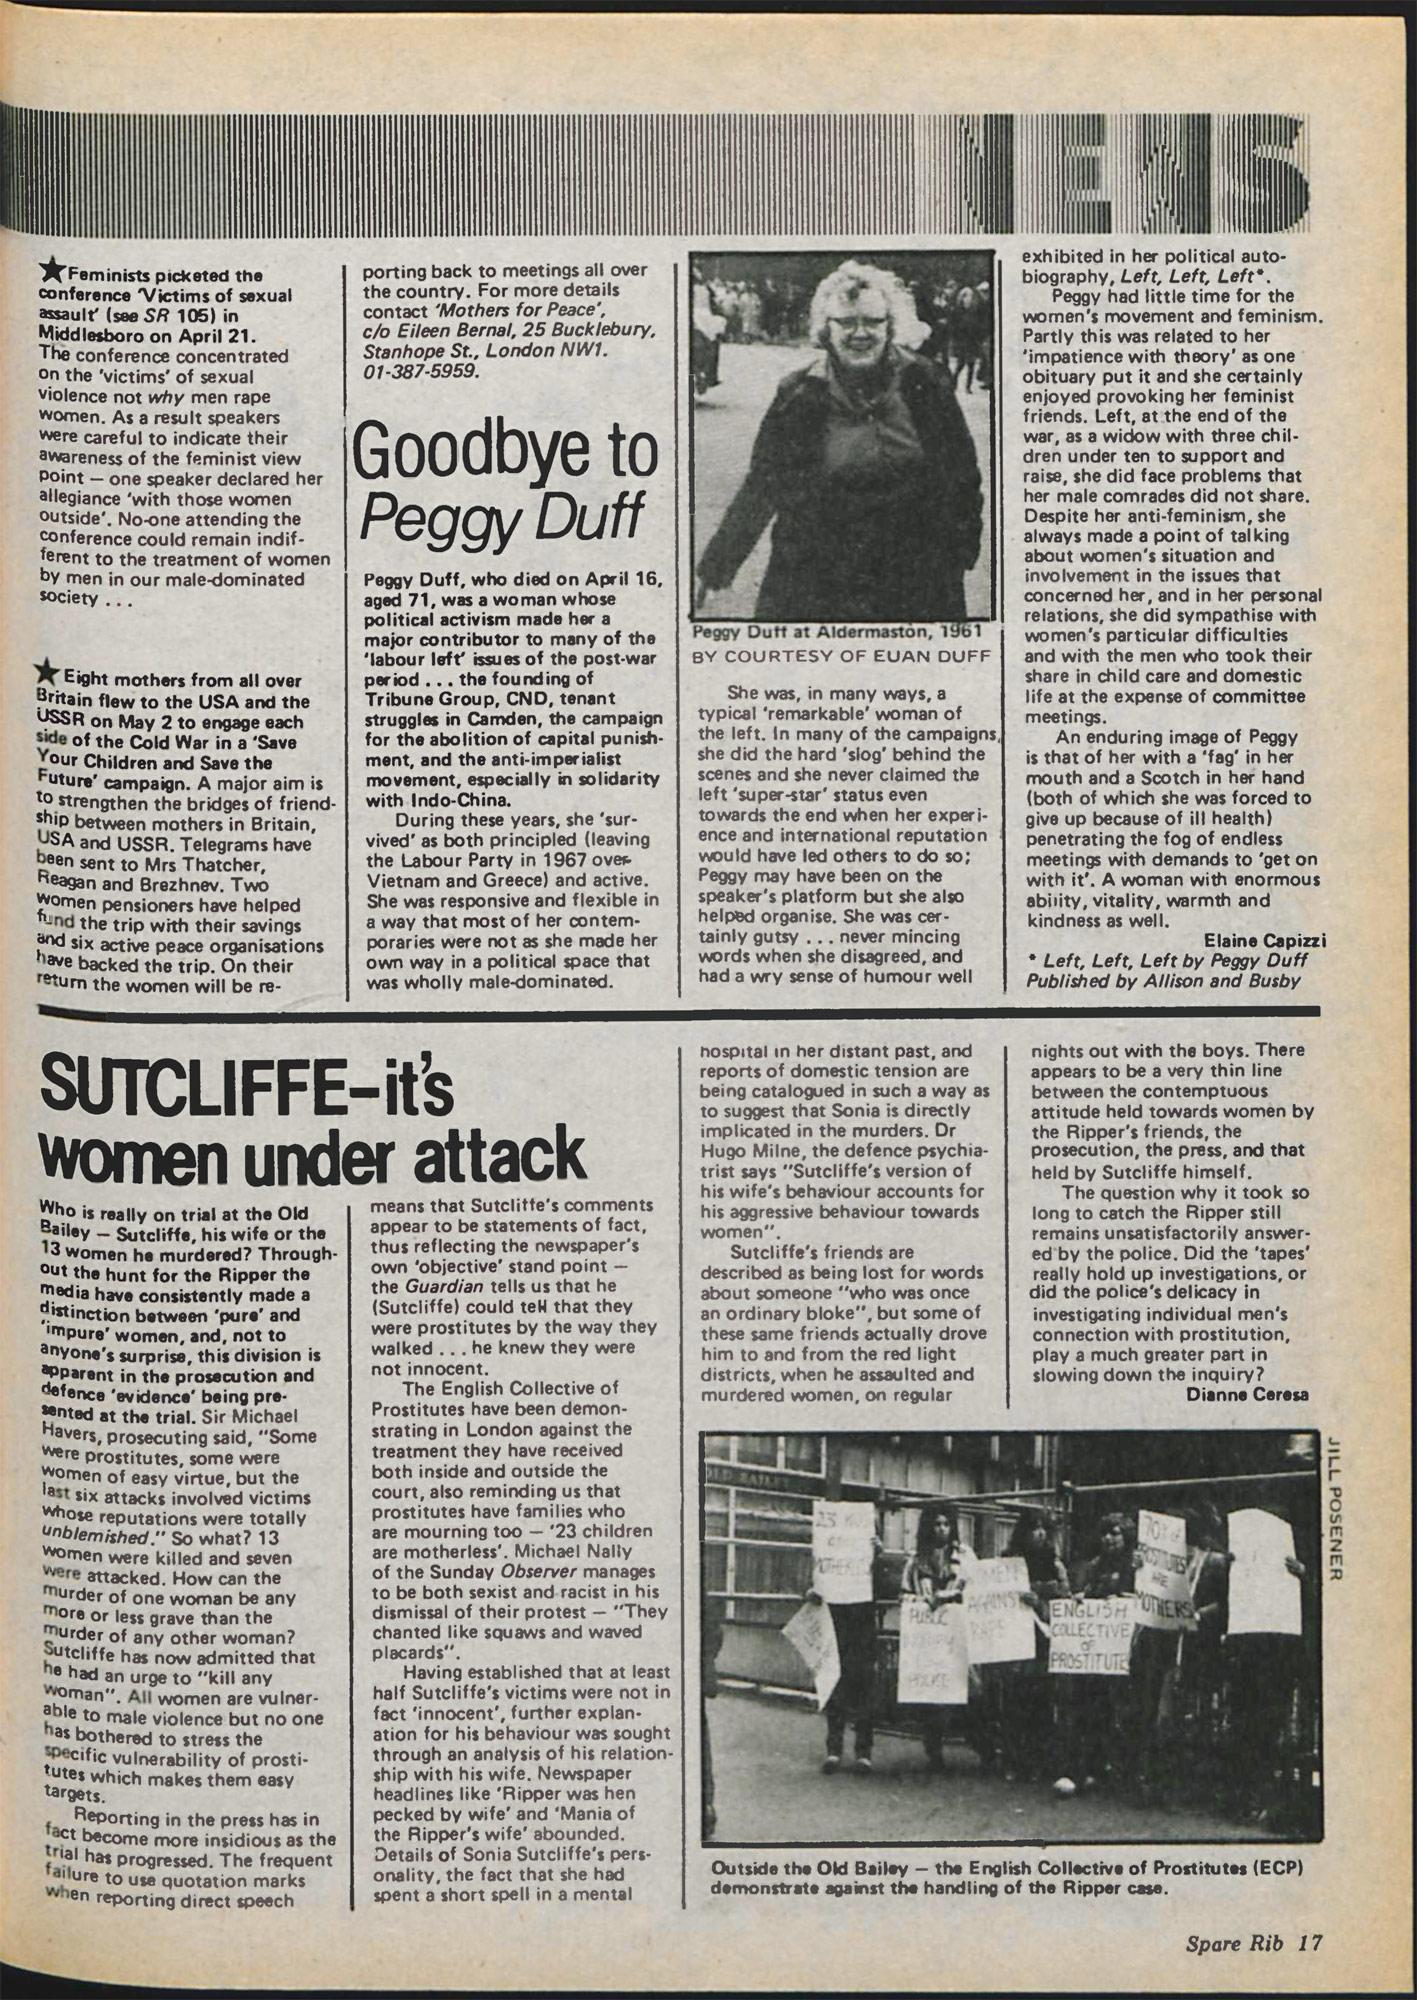 Spare Rib magazine issue 107 Yorkshire Ripper